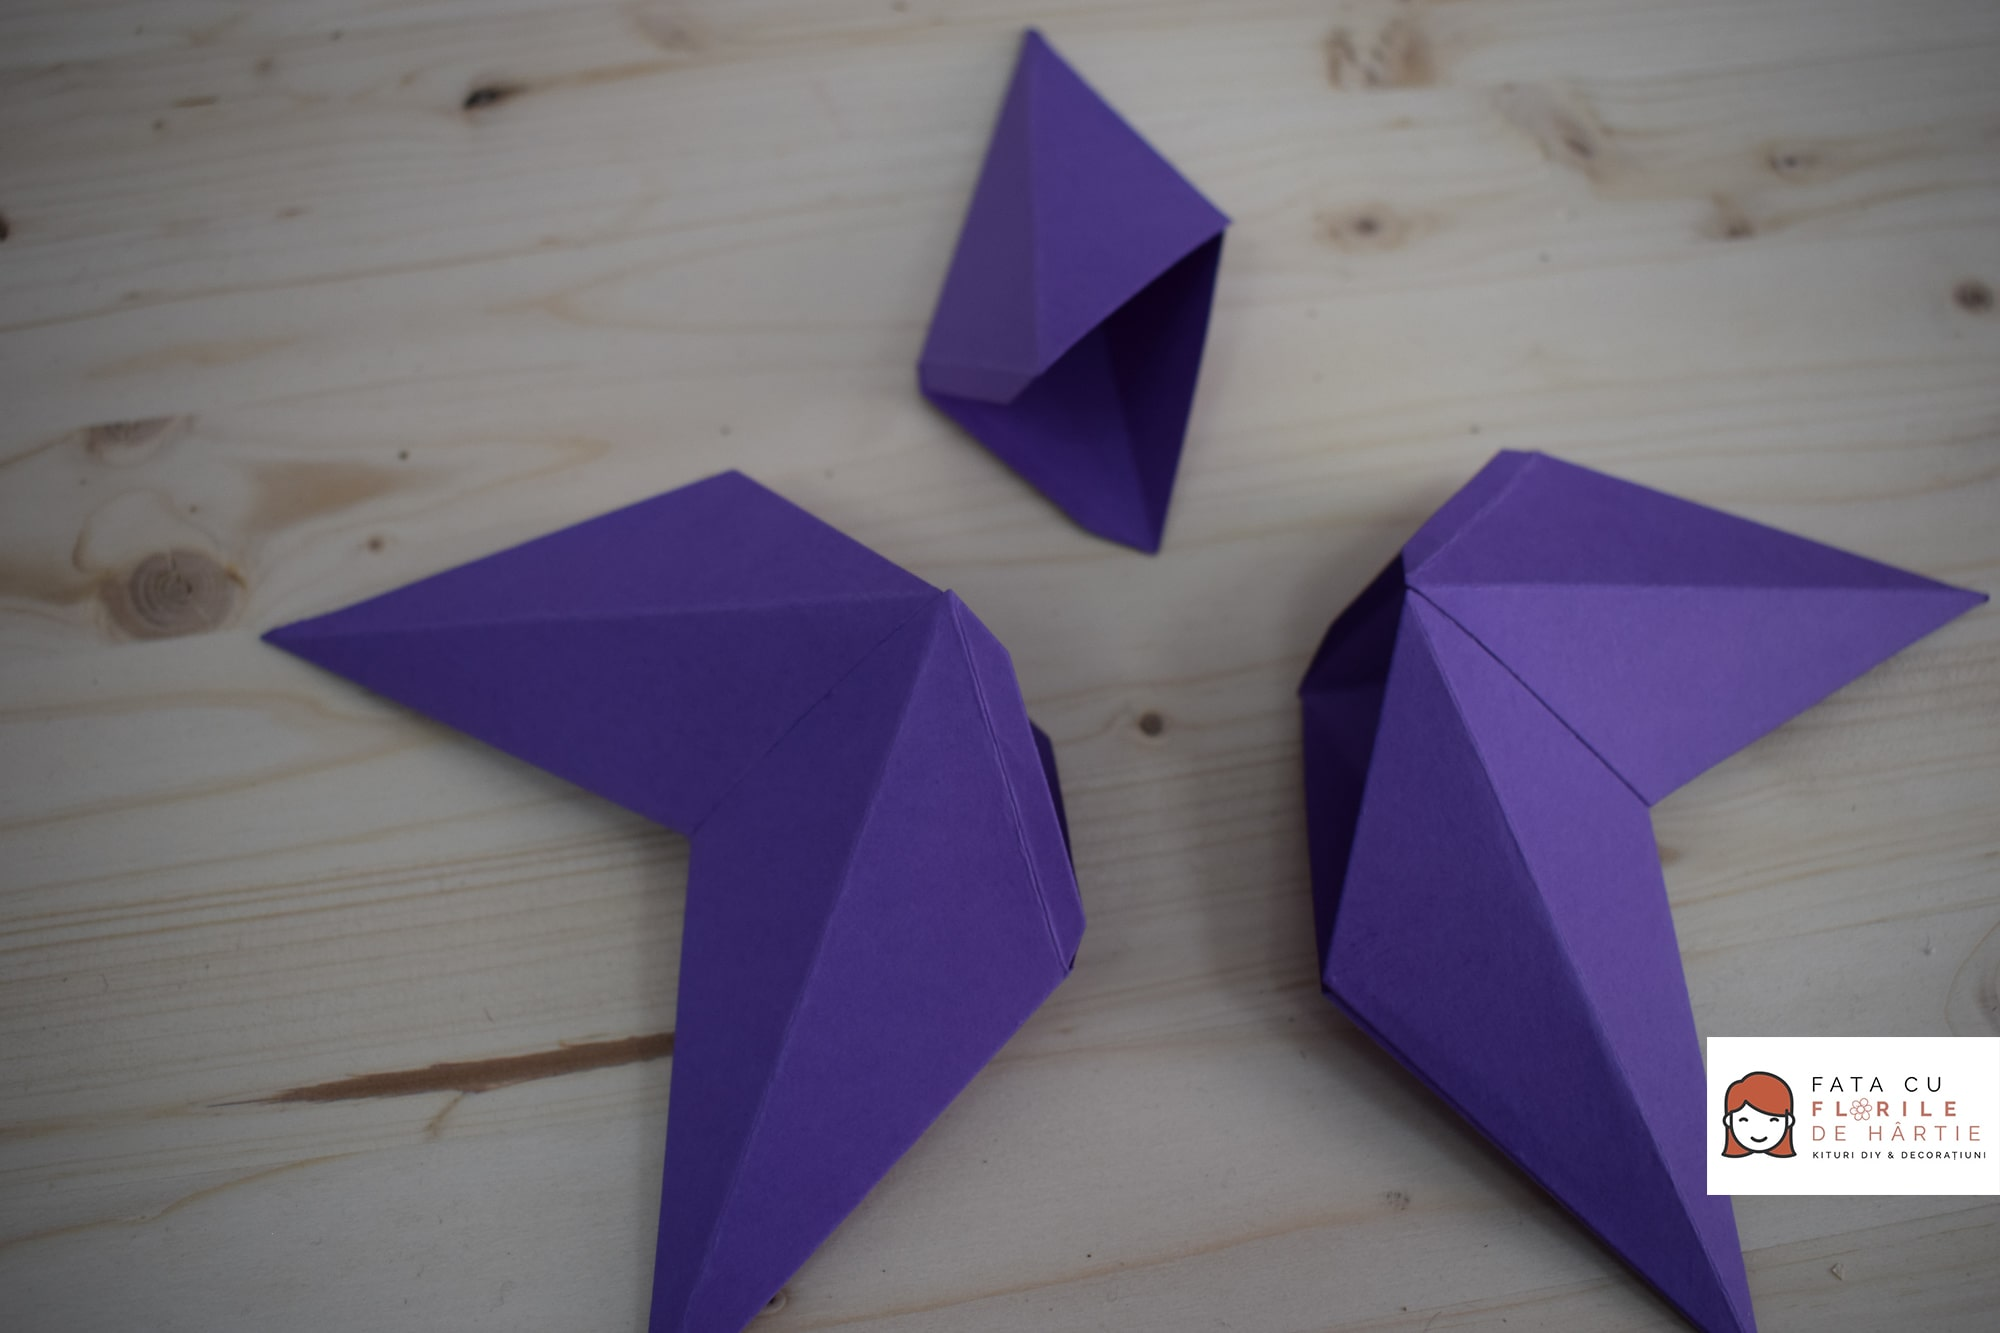 Tutorial Stea 3D de Hartie, cu Sizzix - Vezi toti pasii pe www.fatacufloridehartie.ro